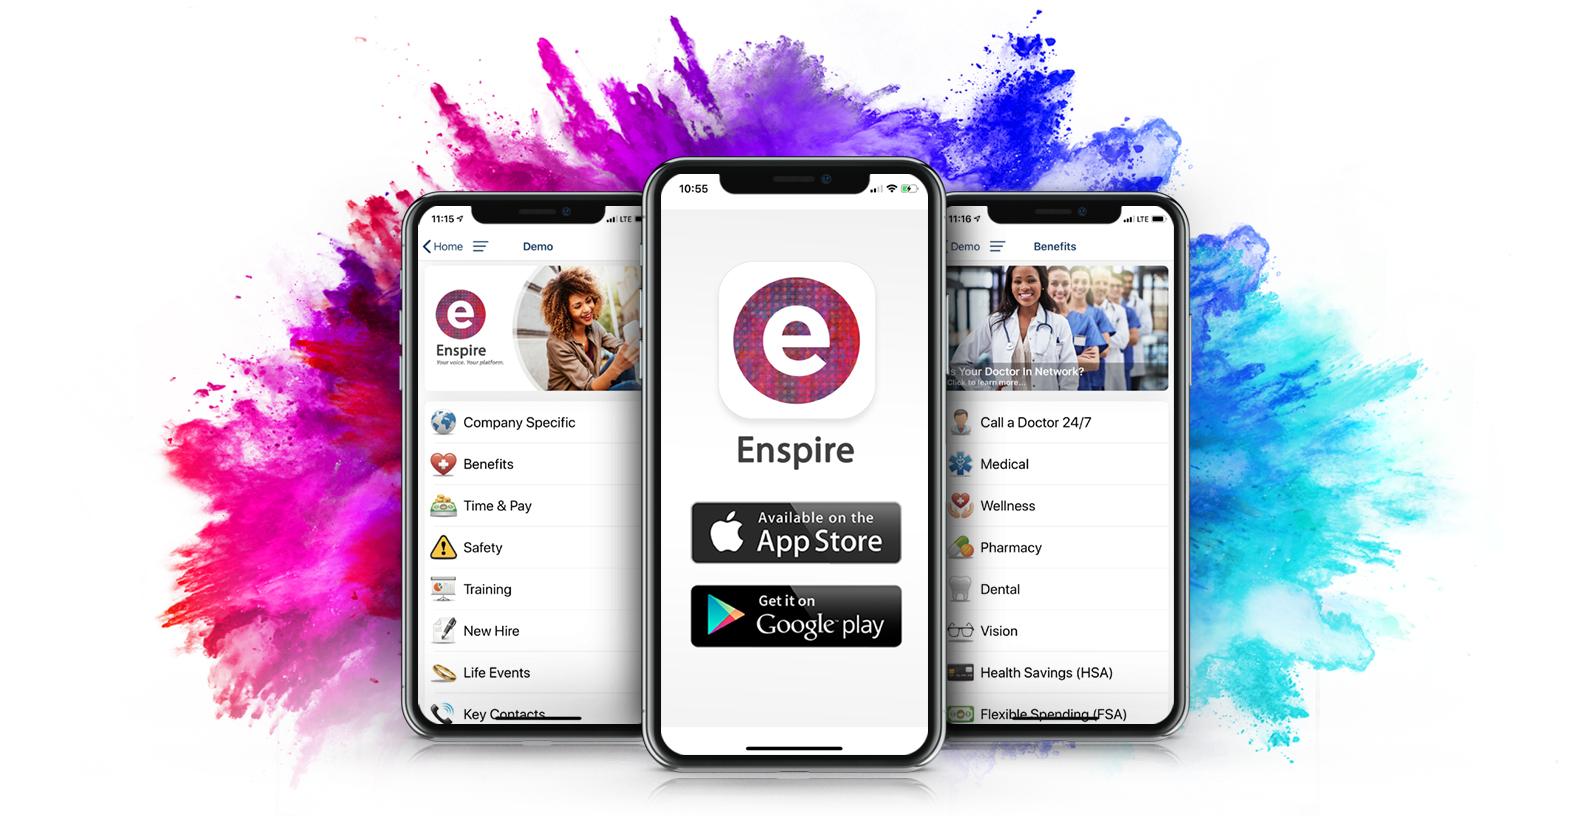 Enspire Banner_iPhoneX3.jpg